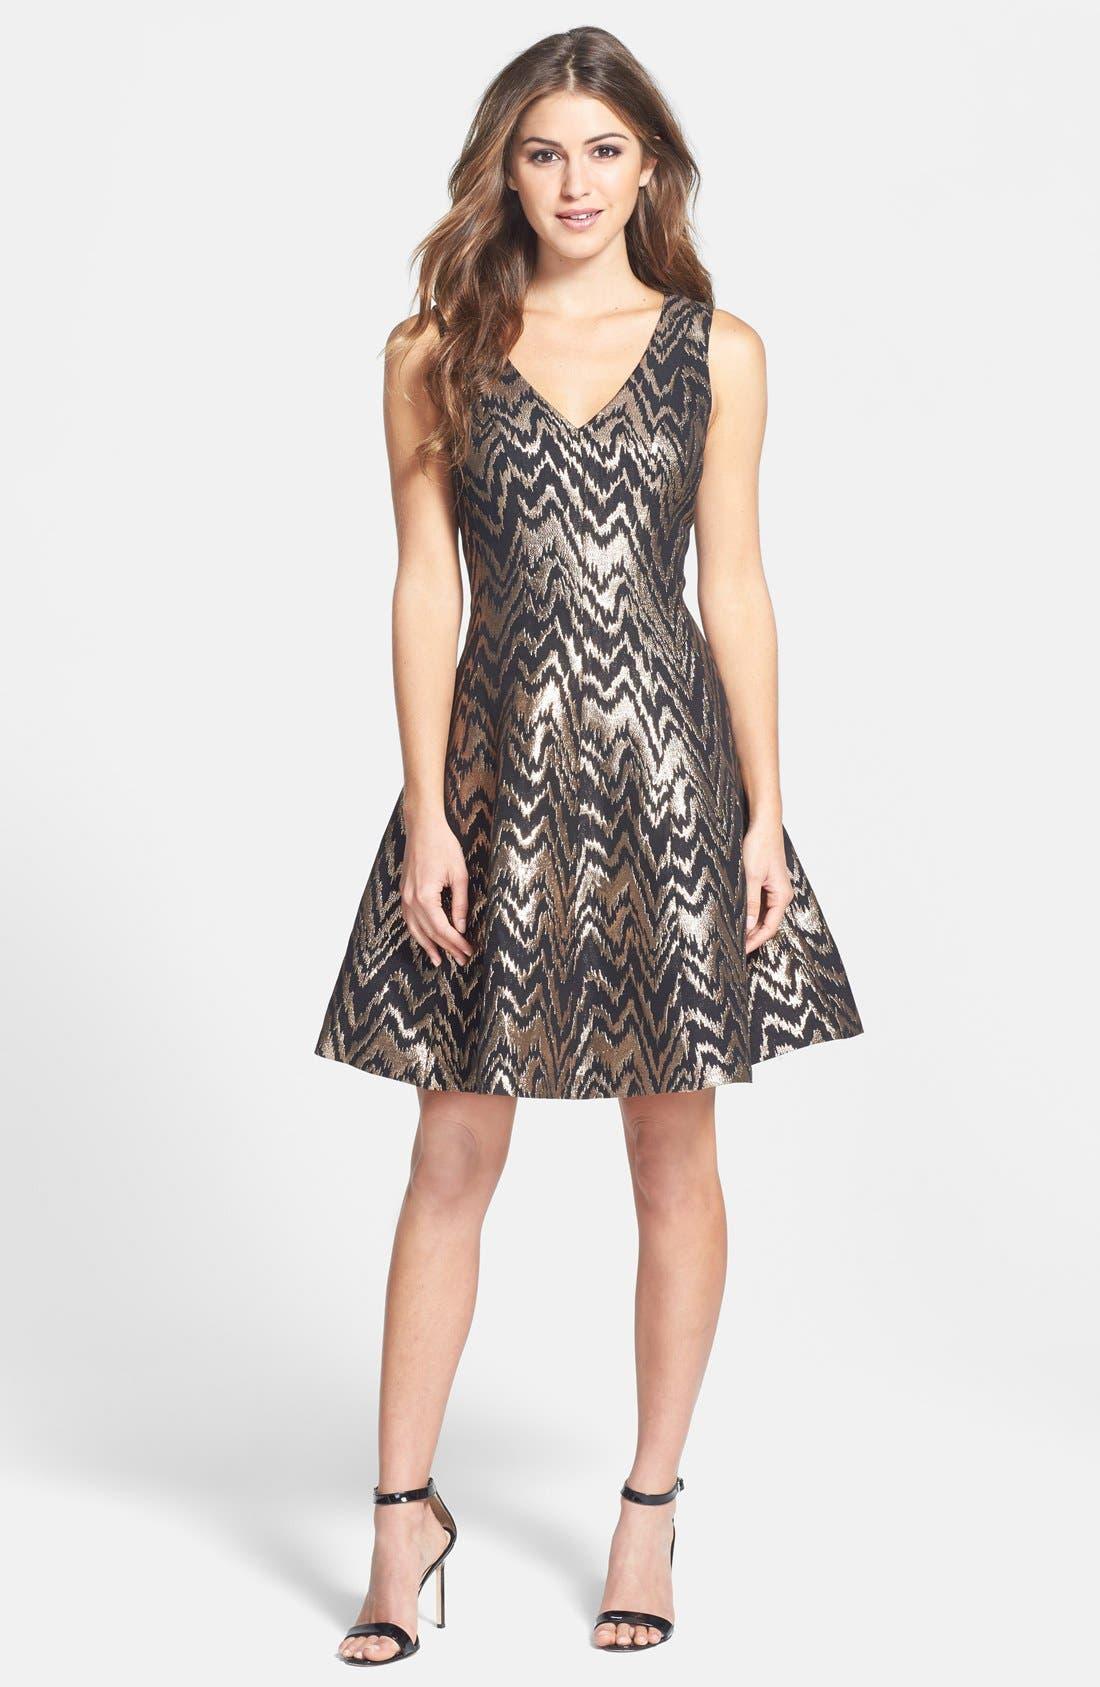 VINCE CAMUTO,                             Metallic Jacquard Fit & Flare Dress,                             Alternate thumbnail 2, color,                             226